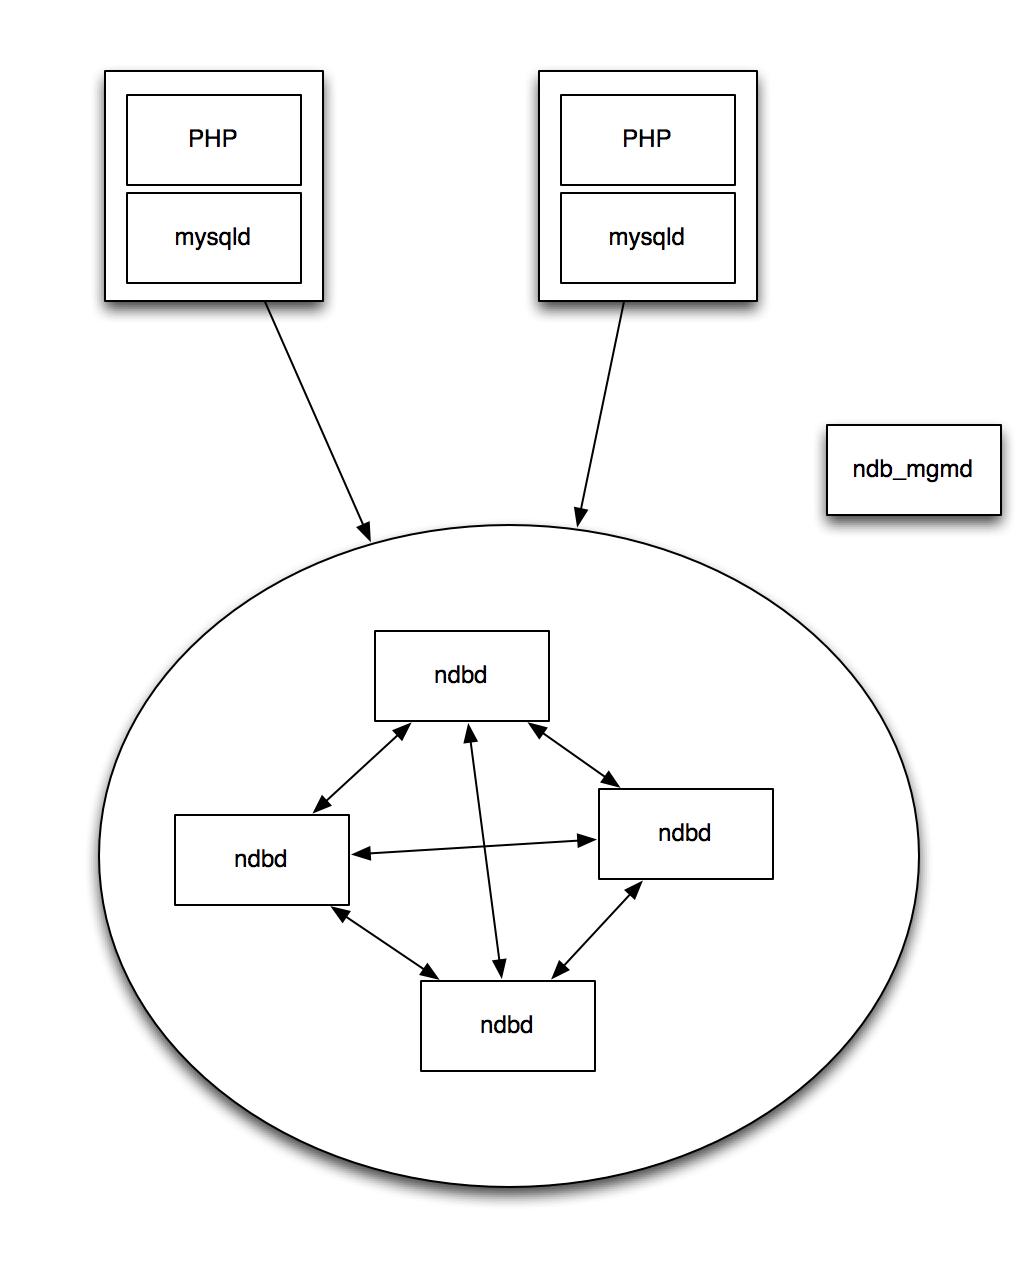 Mysql Cluster Architecture Considerations